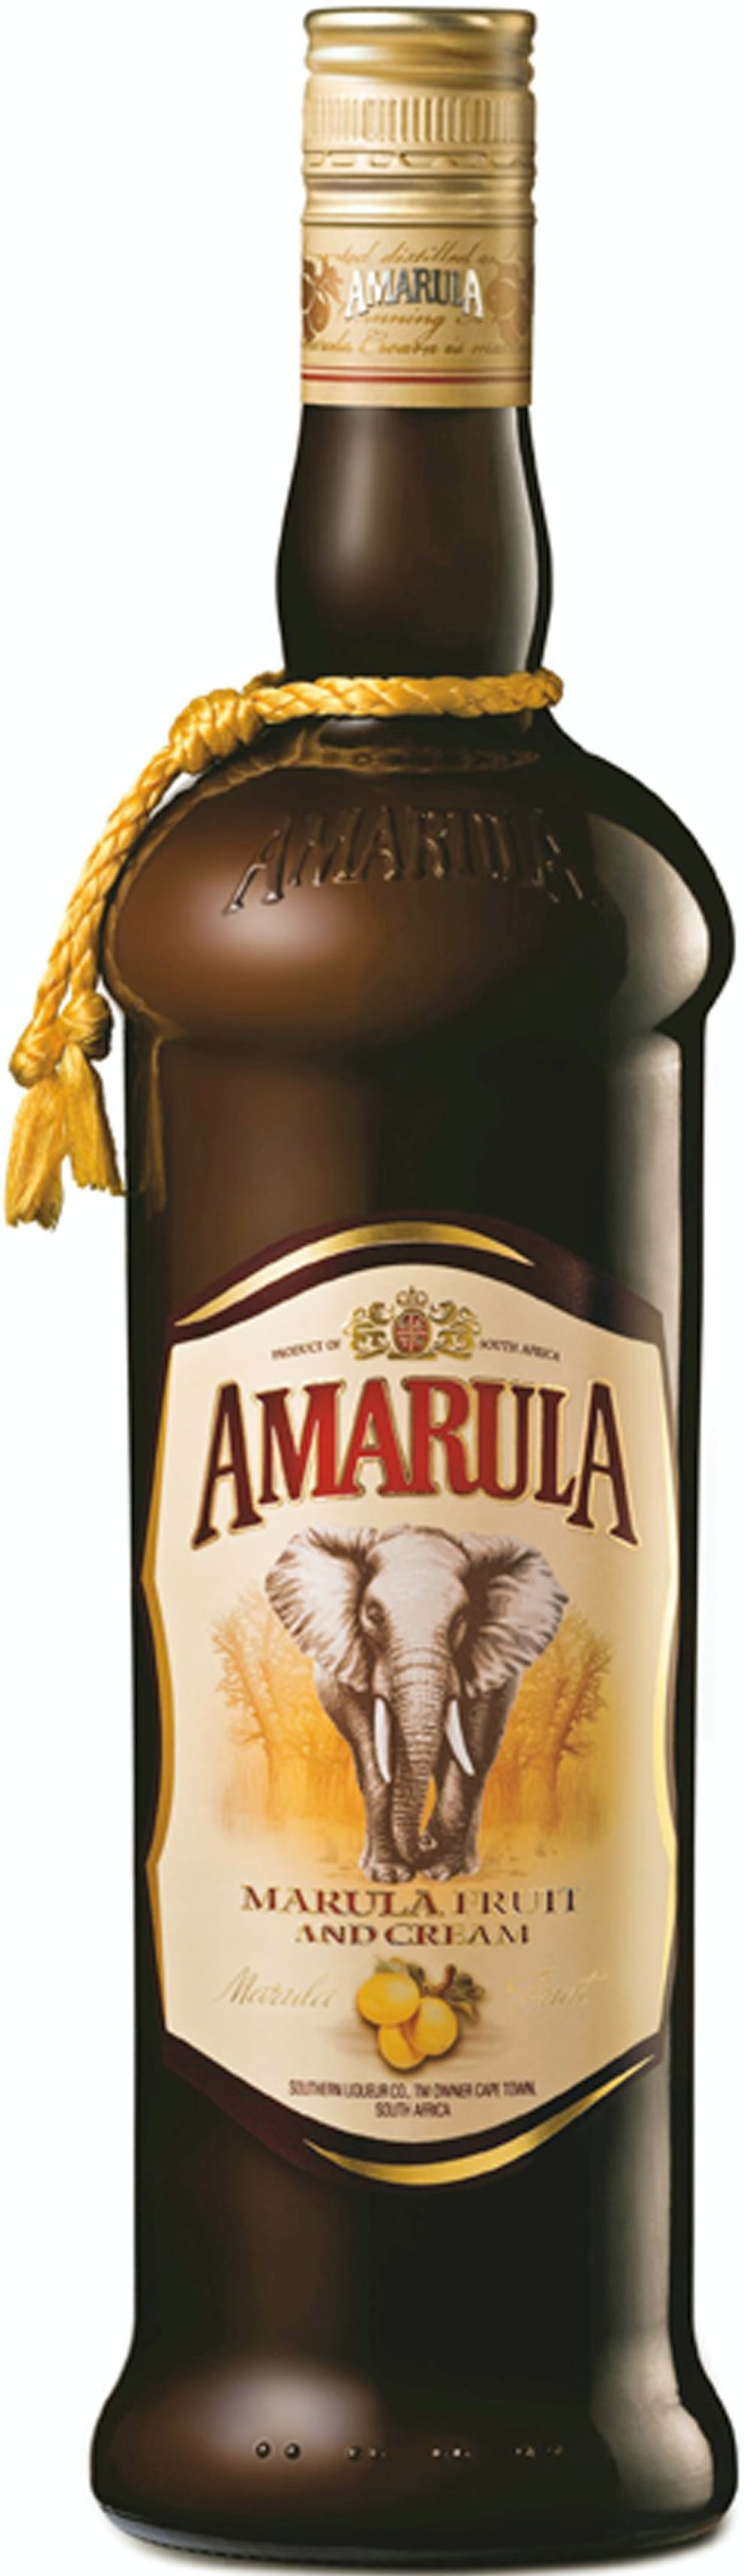 Amarula Marula Fruit Cream Liqueur, South Africa: